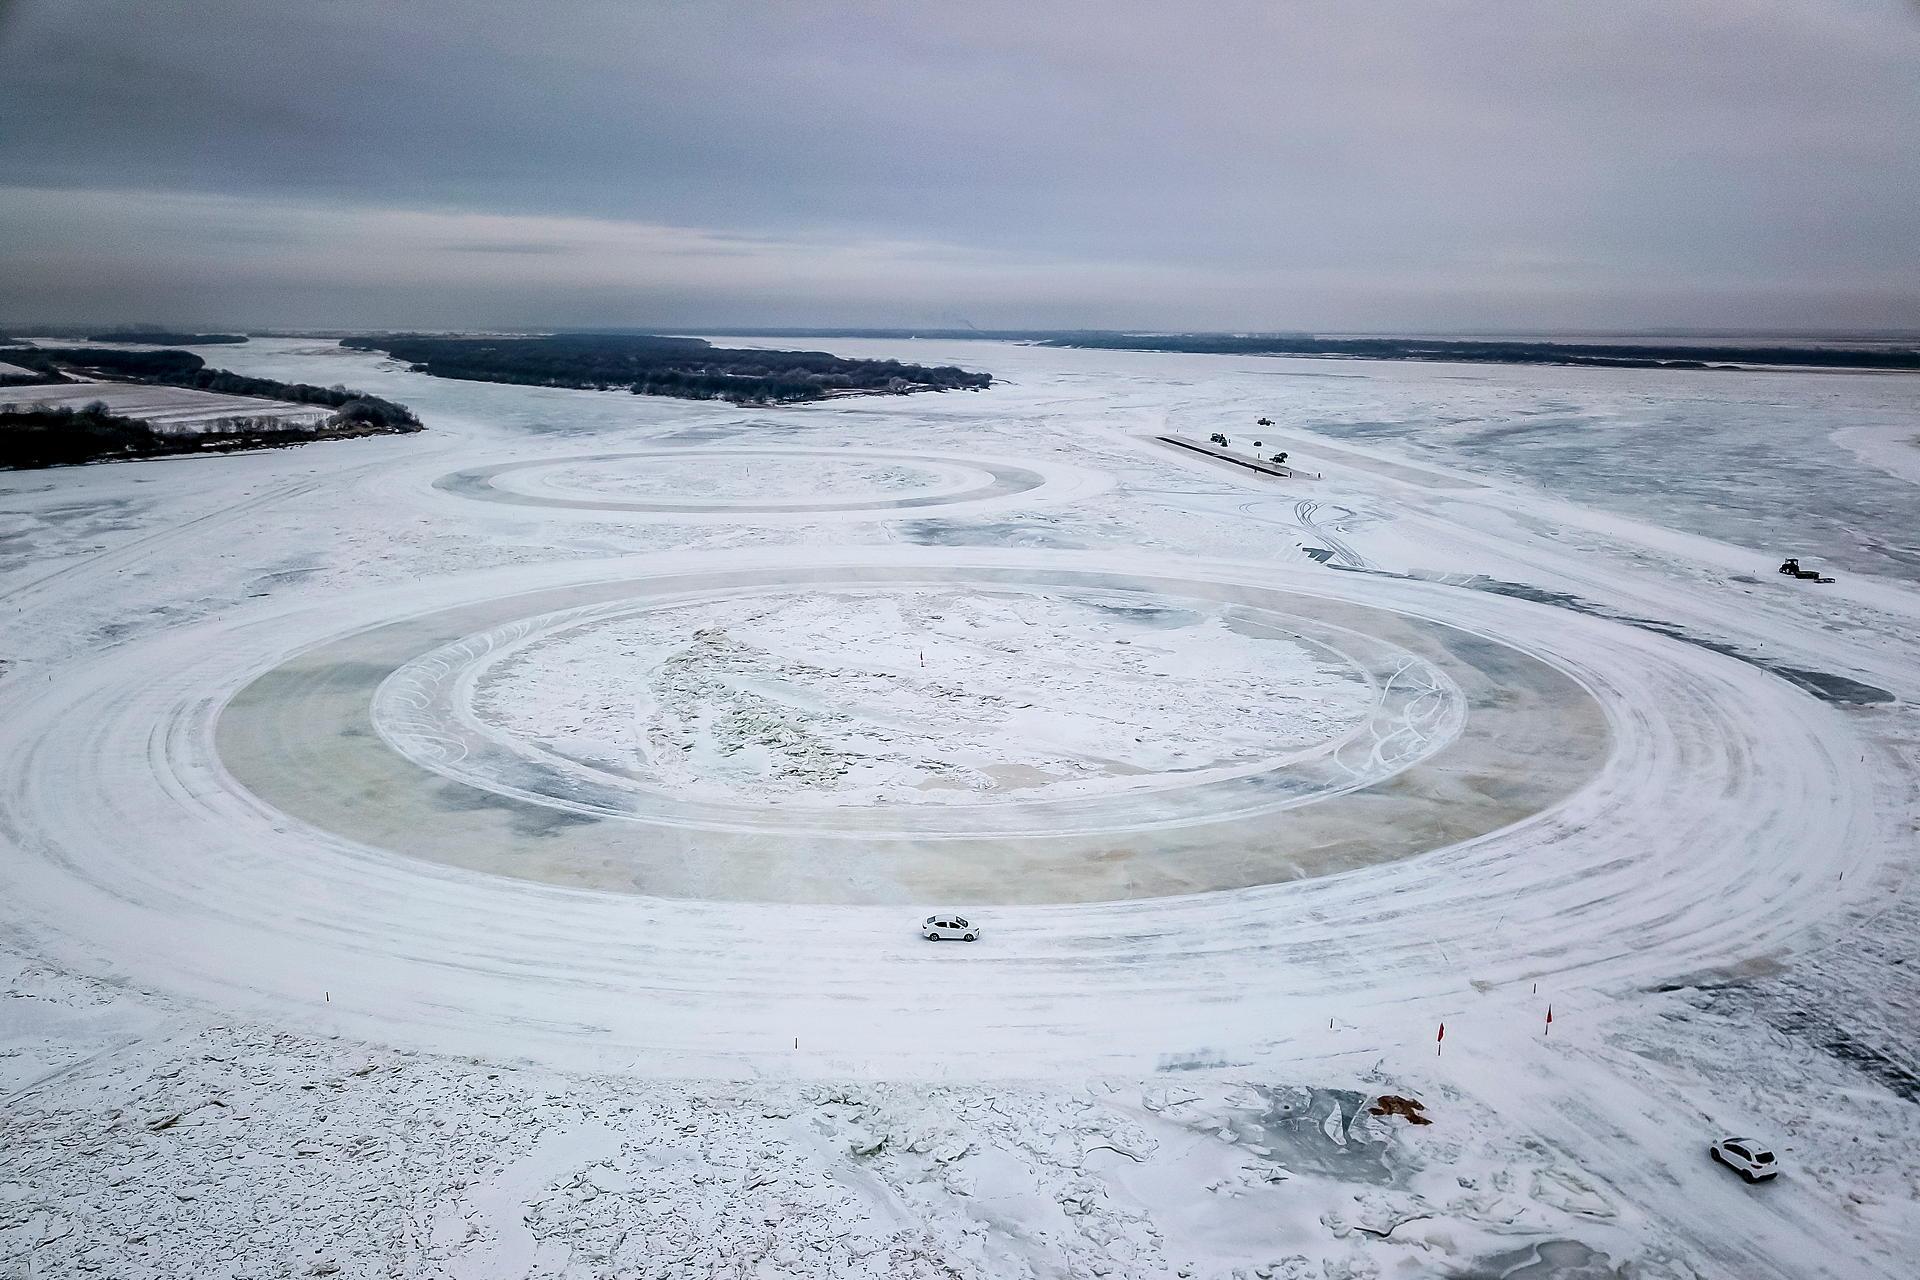 Matjaž Krivic - Lithium: The Driving Force of the 21st Century - Felix Schoeller Photoaward